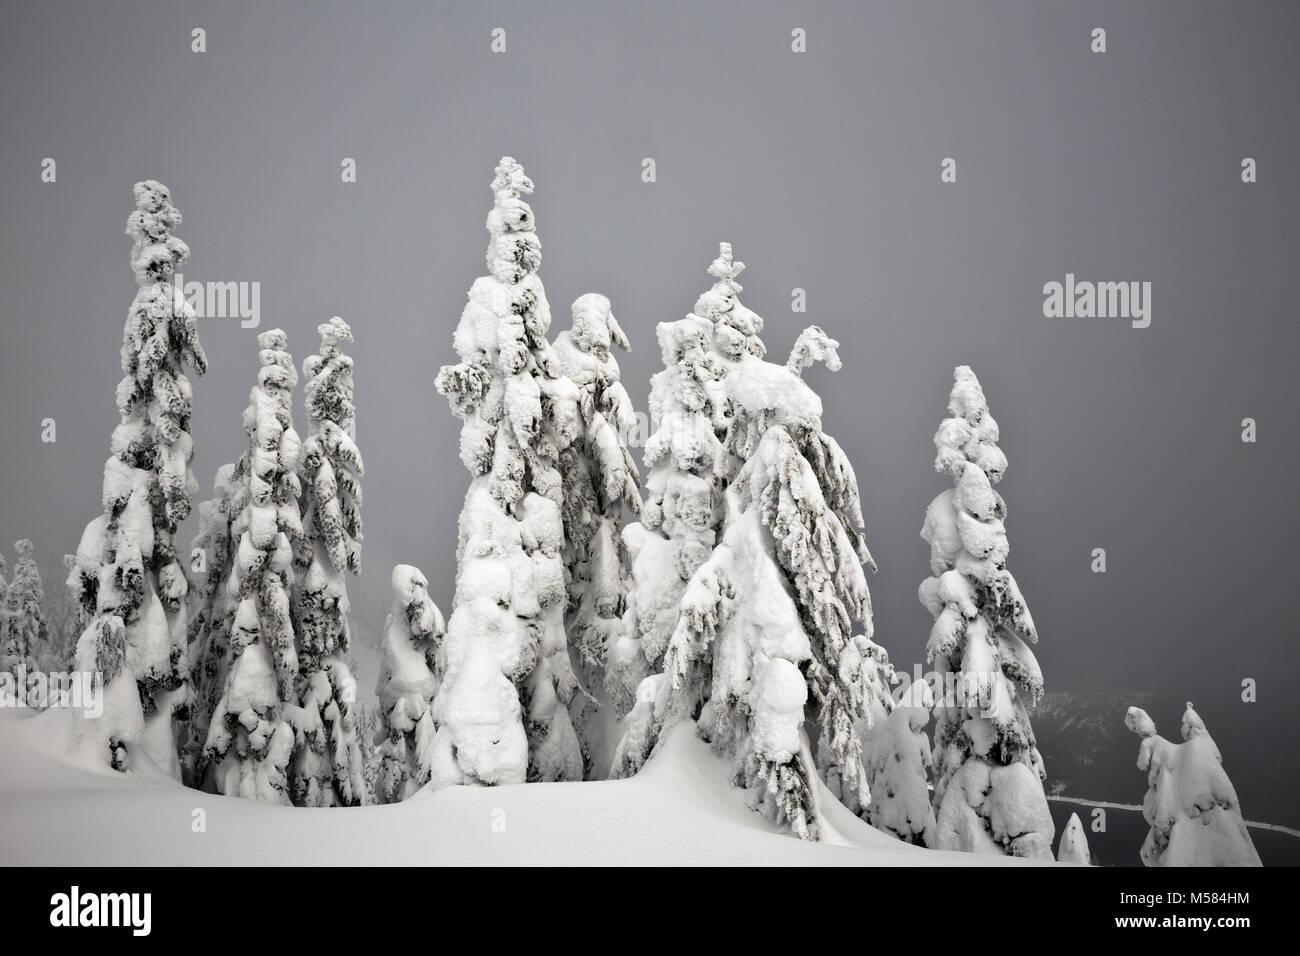 WA13525-00...WASHINGTON - Snow covered trees along the cross-country ski route on Amabilis Mountain in the Okanogan - Stock Image